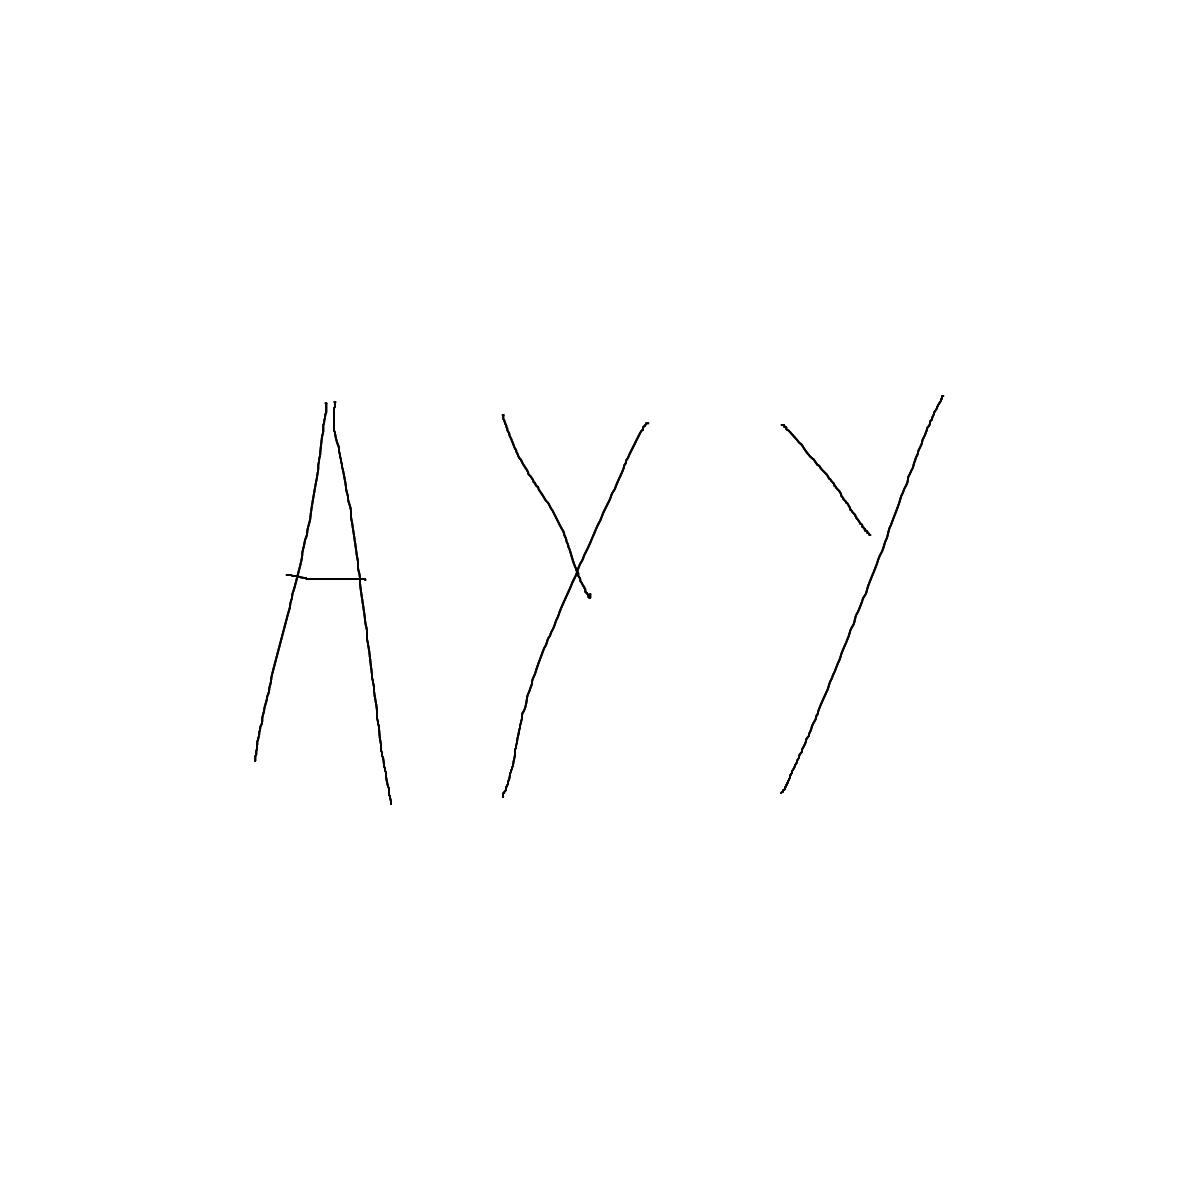 BAAAM drawing#598 lat:-33.8336219787597660lng: 151.2803802490234400